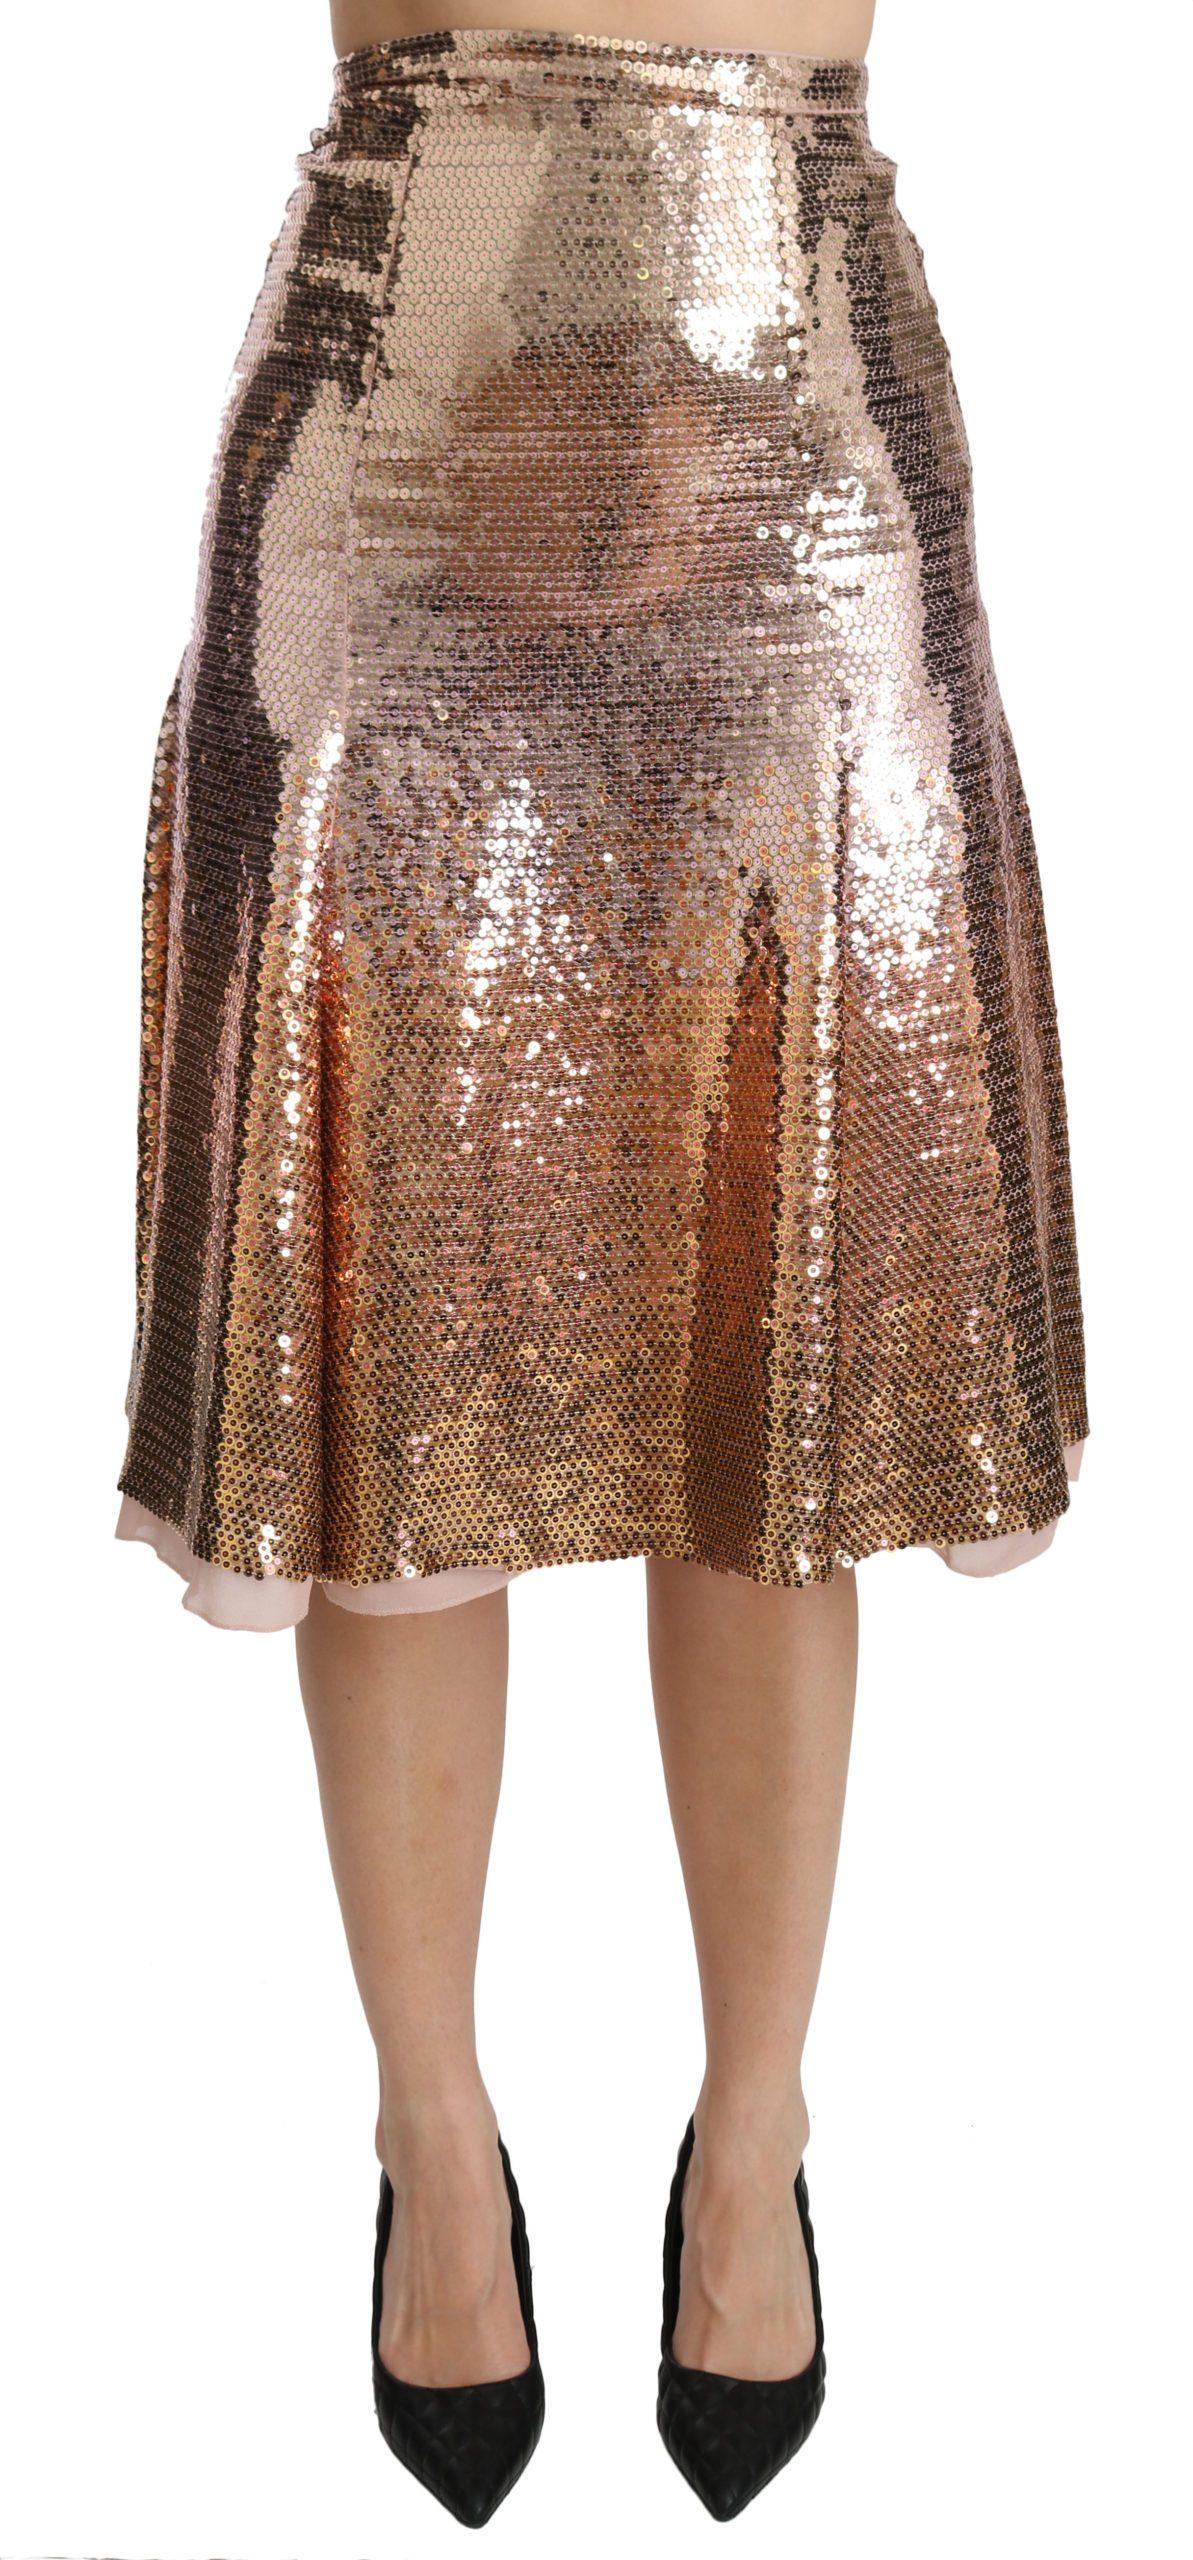 Dolce & Gabbana Women's Sequined High Waist Midi Skirt Gold SKI1343 - IT40 S